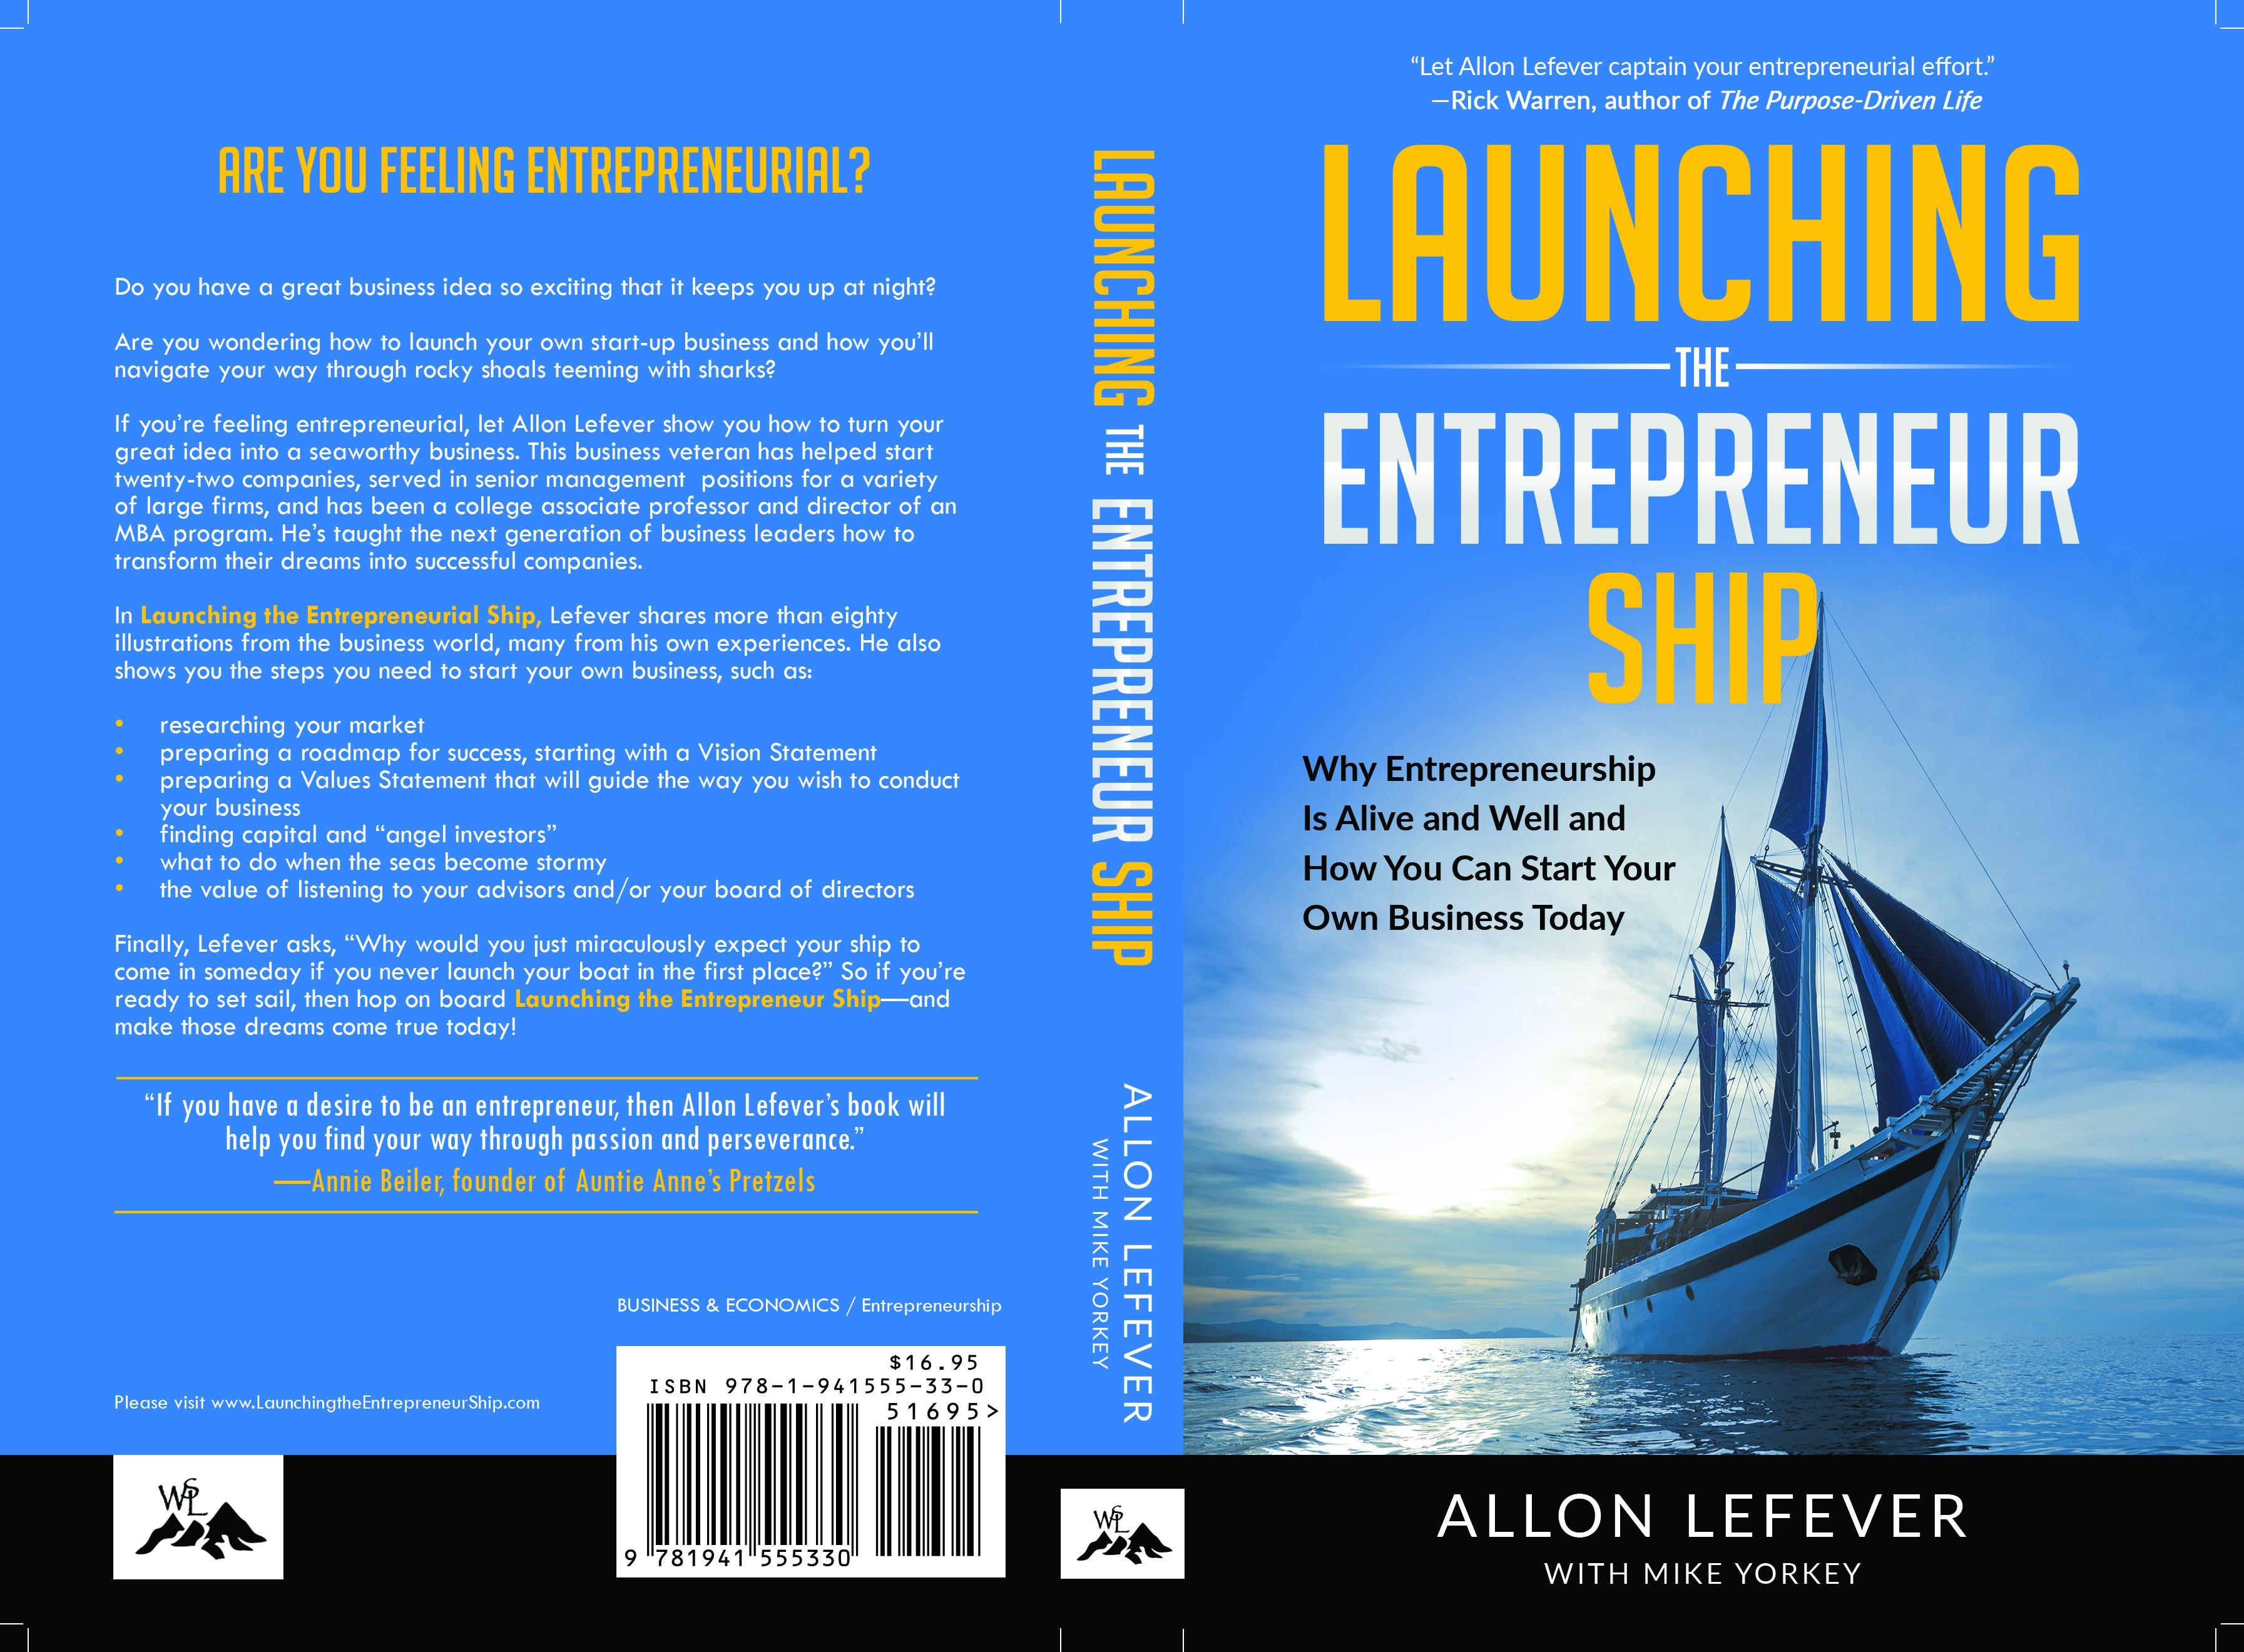 Entrepreneurship Book needs eye-catching cover